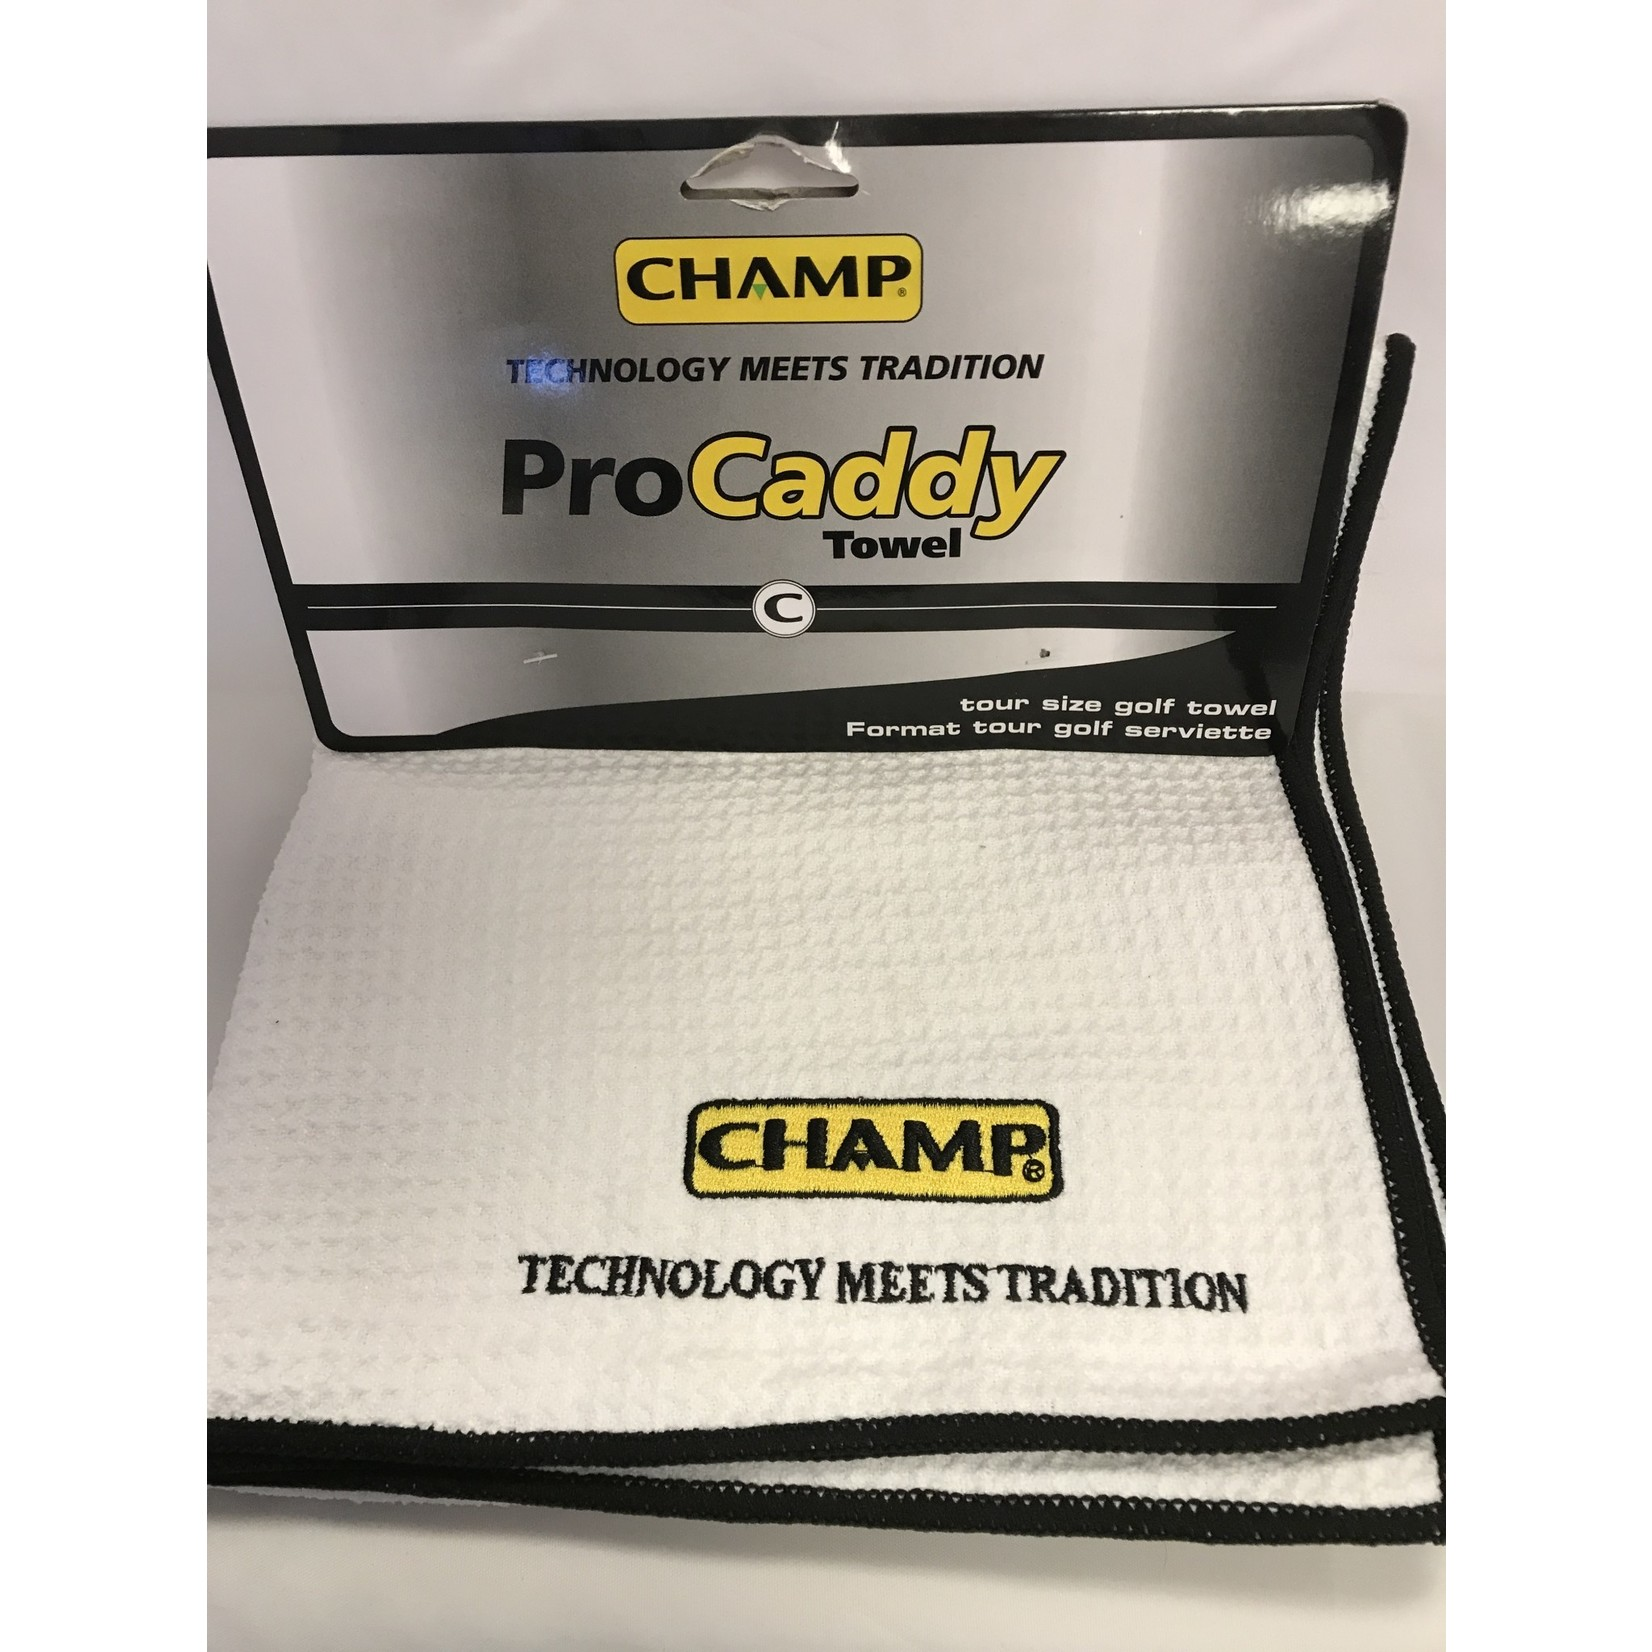 Champ Champ  Pro Caddy Towel